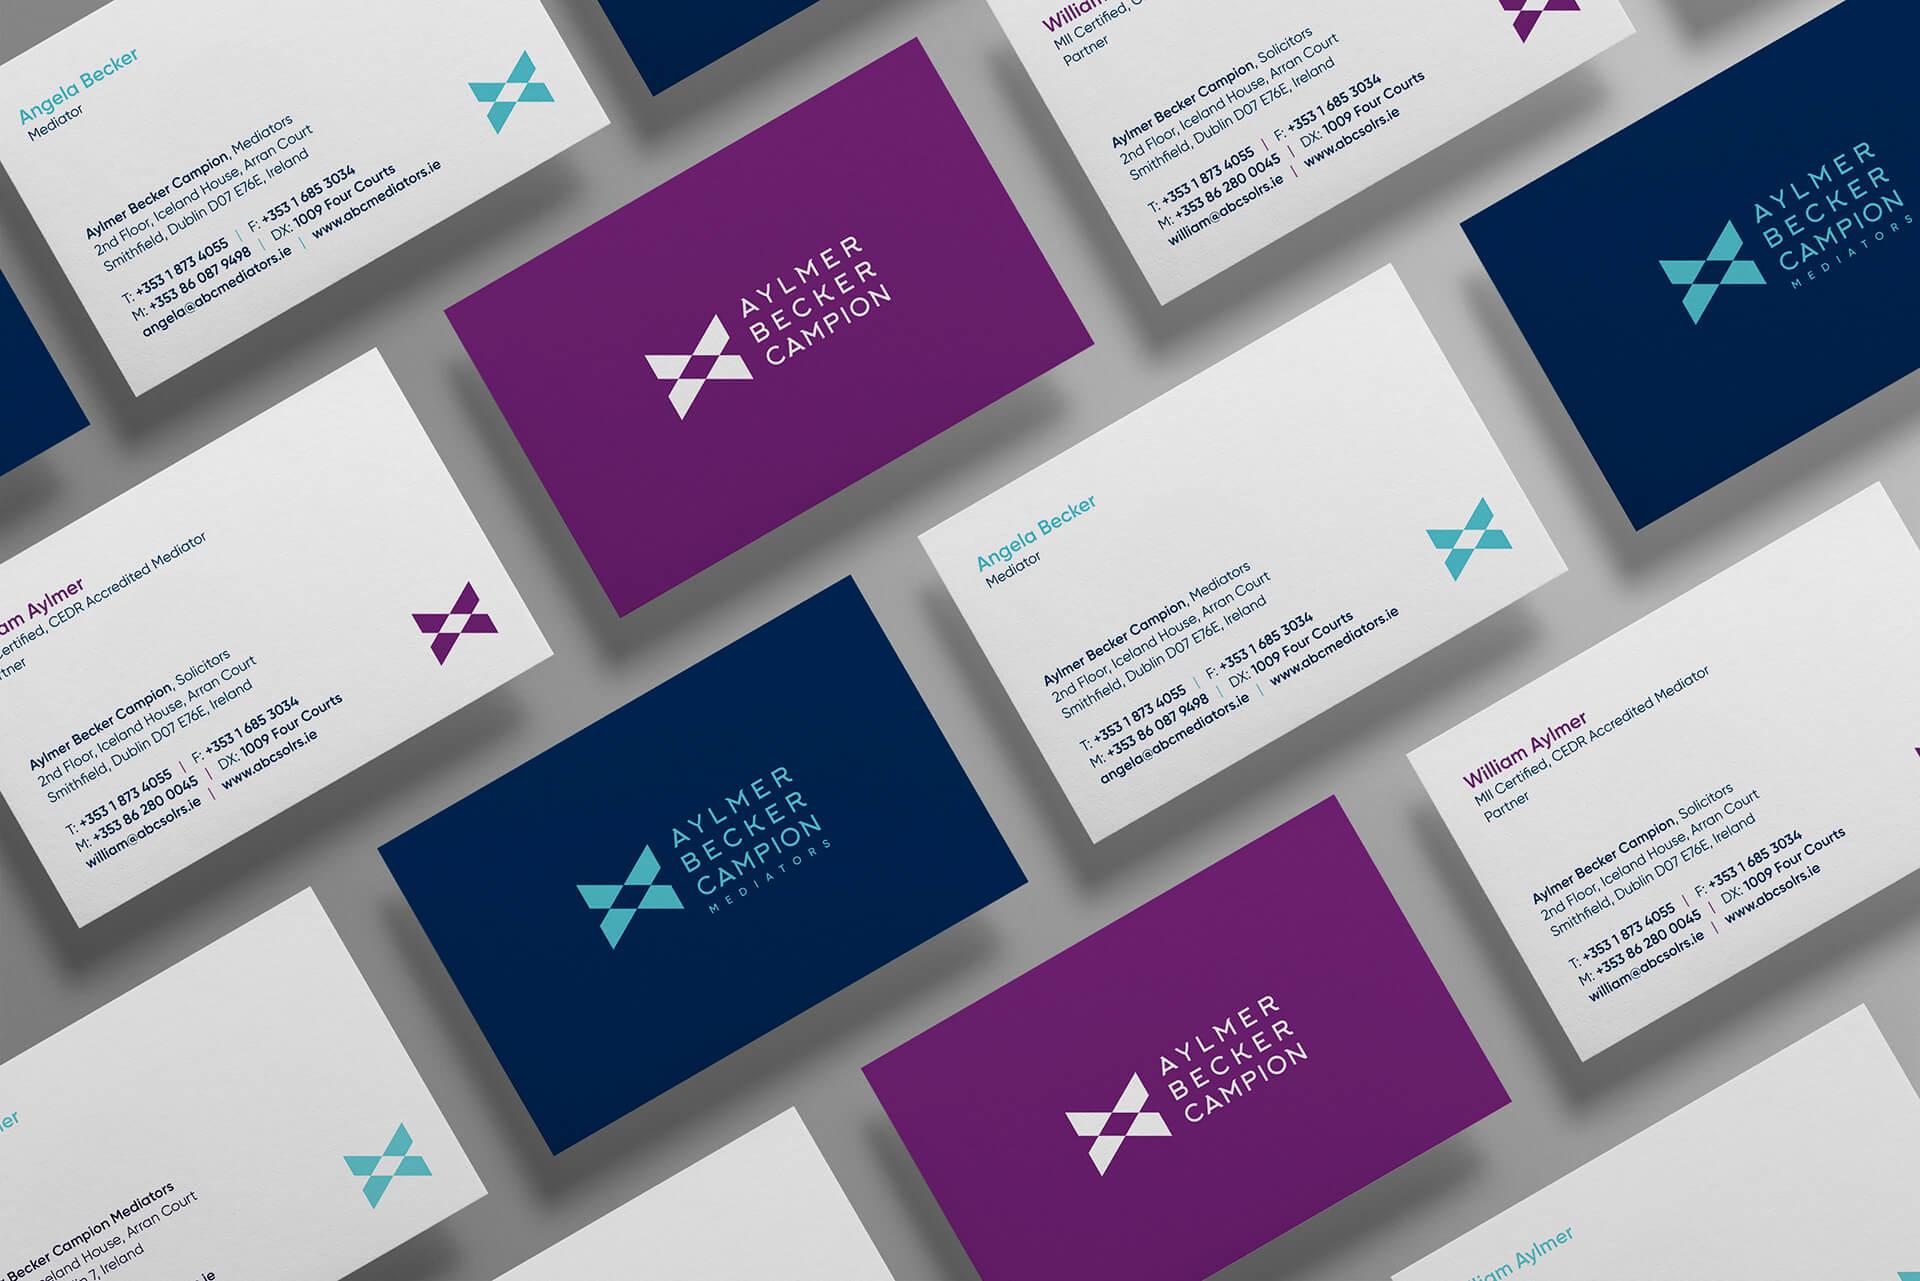 aylmer becker campion solicitors business cards